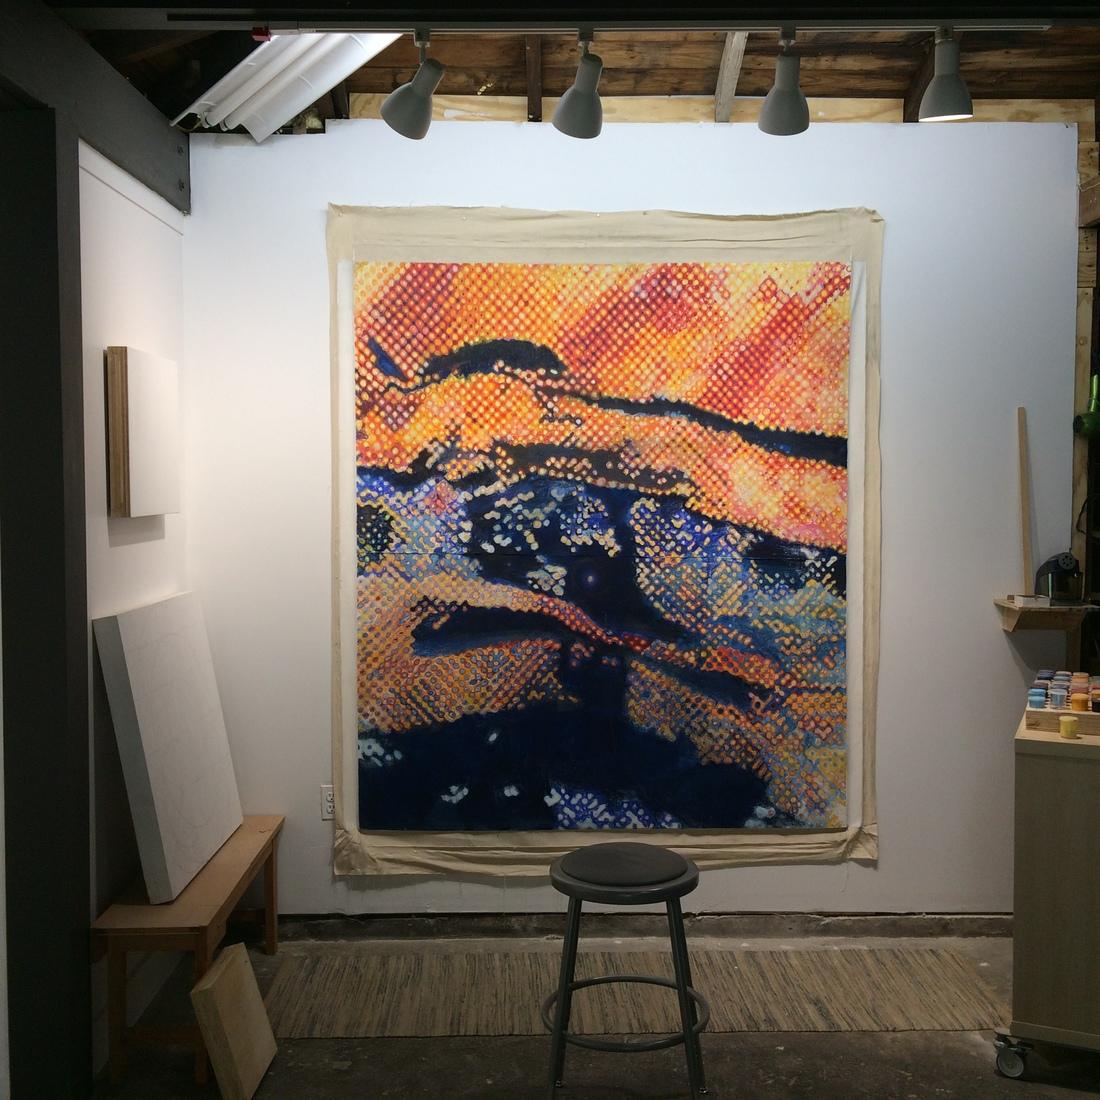 Aron Johnston's Foundation Art Studio Foundation Art Studio